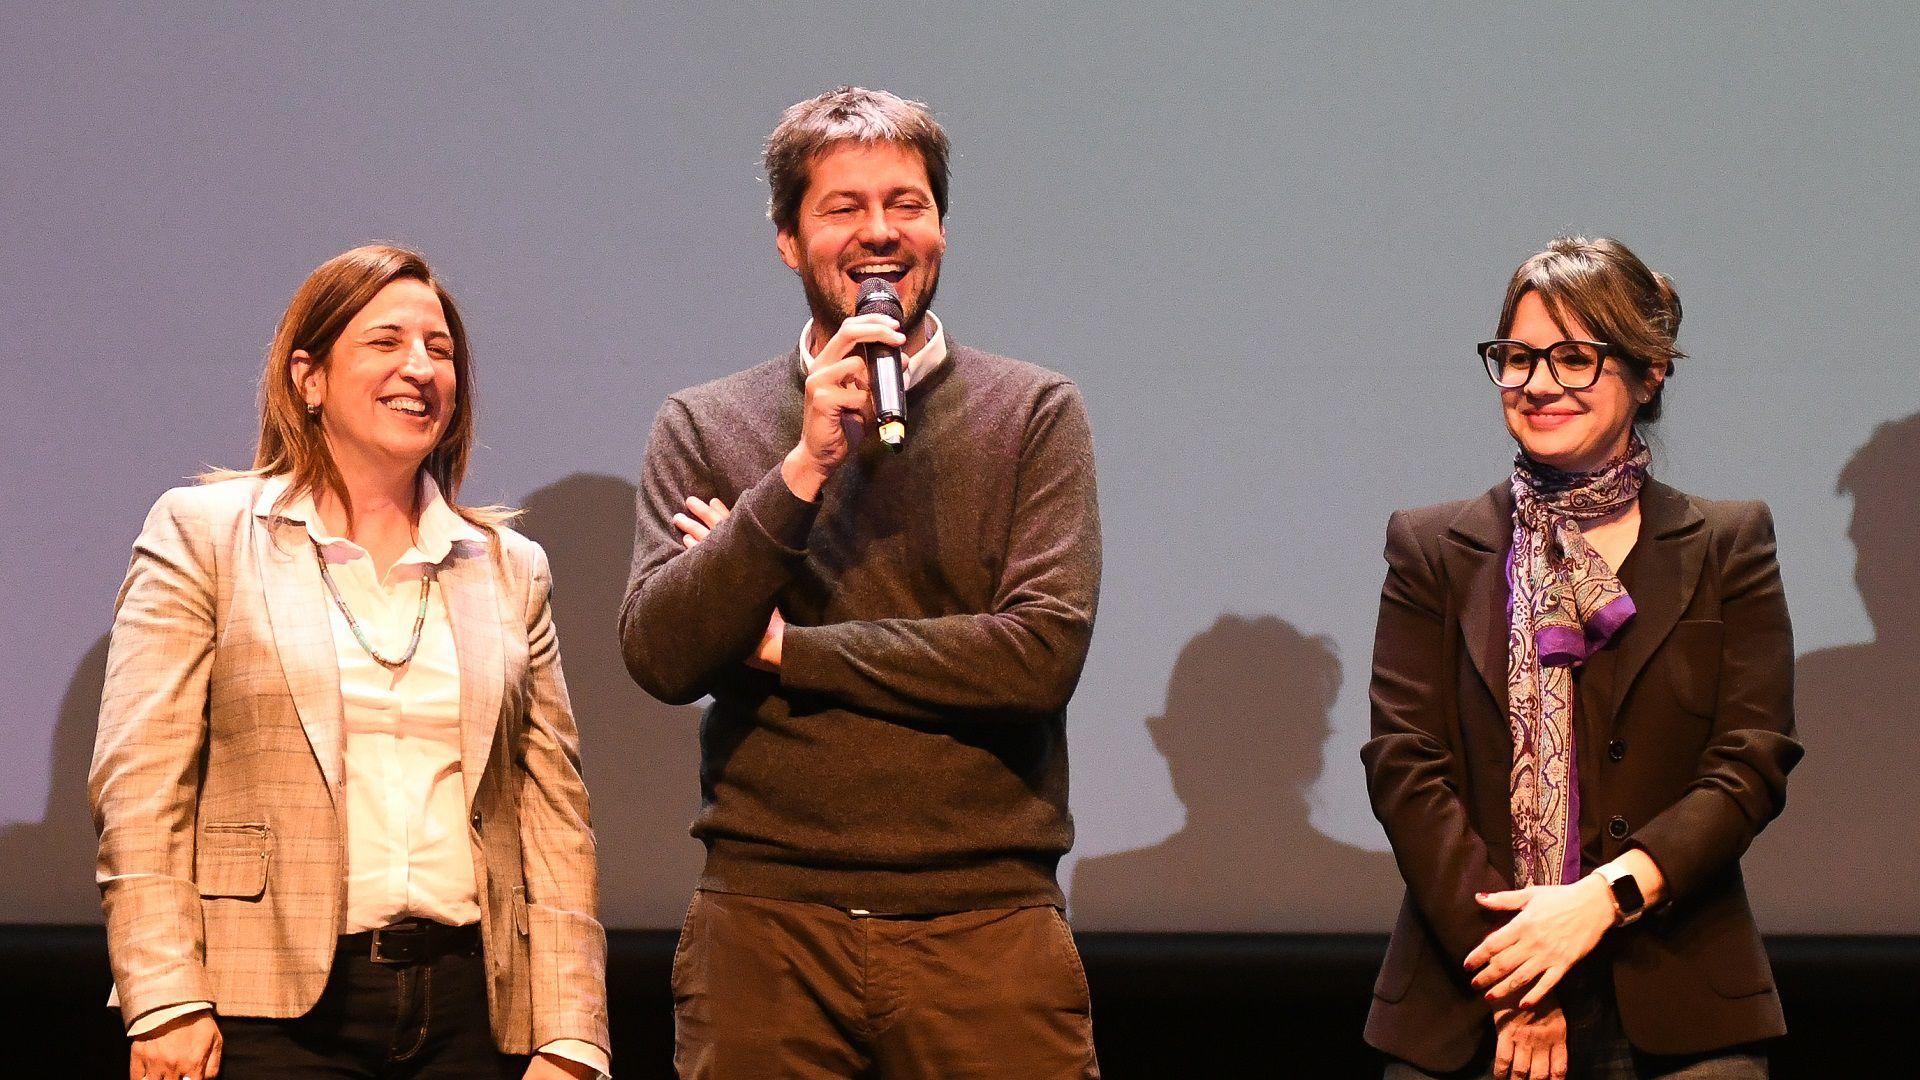 Claudia Neira, Matías Lammens y Gisela Marziotta